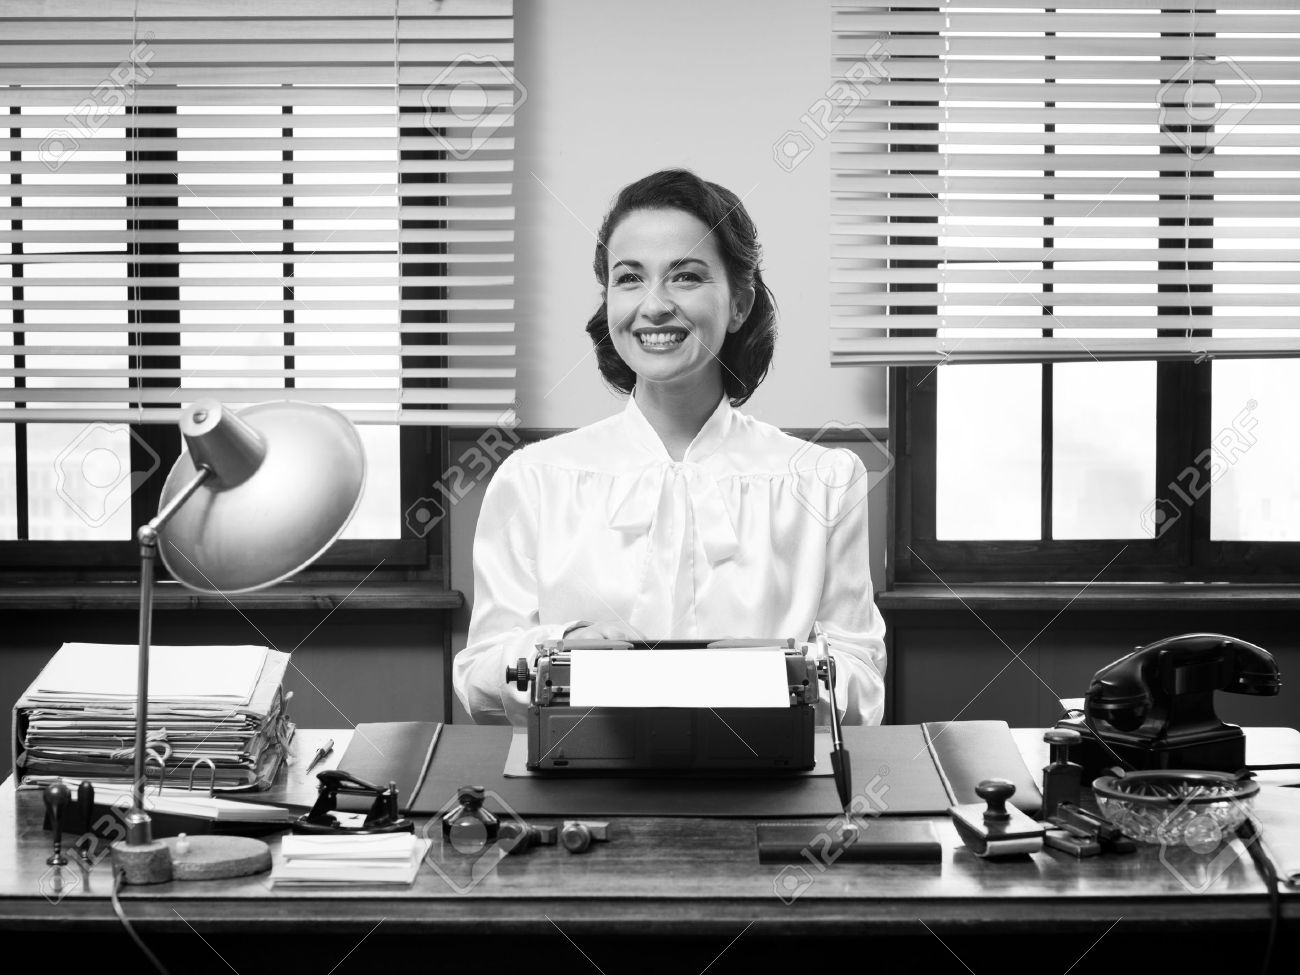 Secretary Stock Photos & Pictures. Royalty Free Secretary Images ...